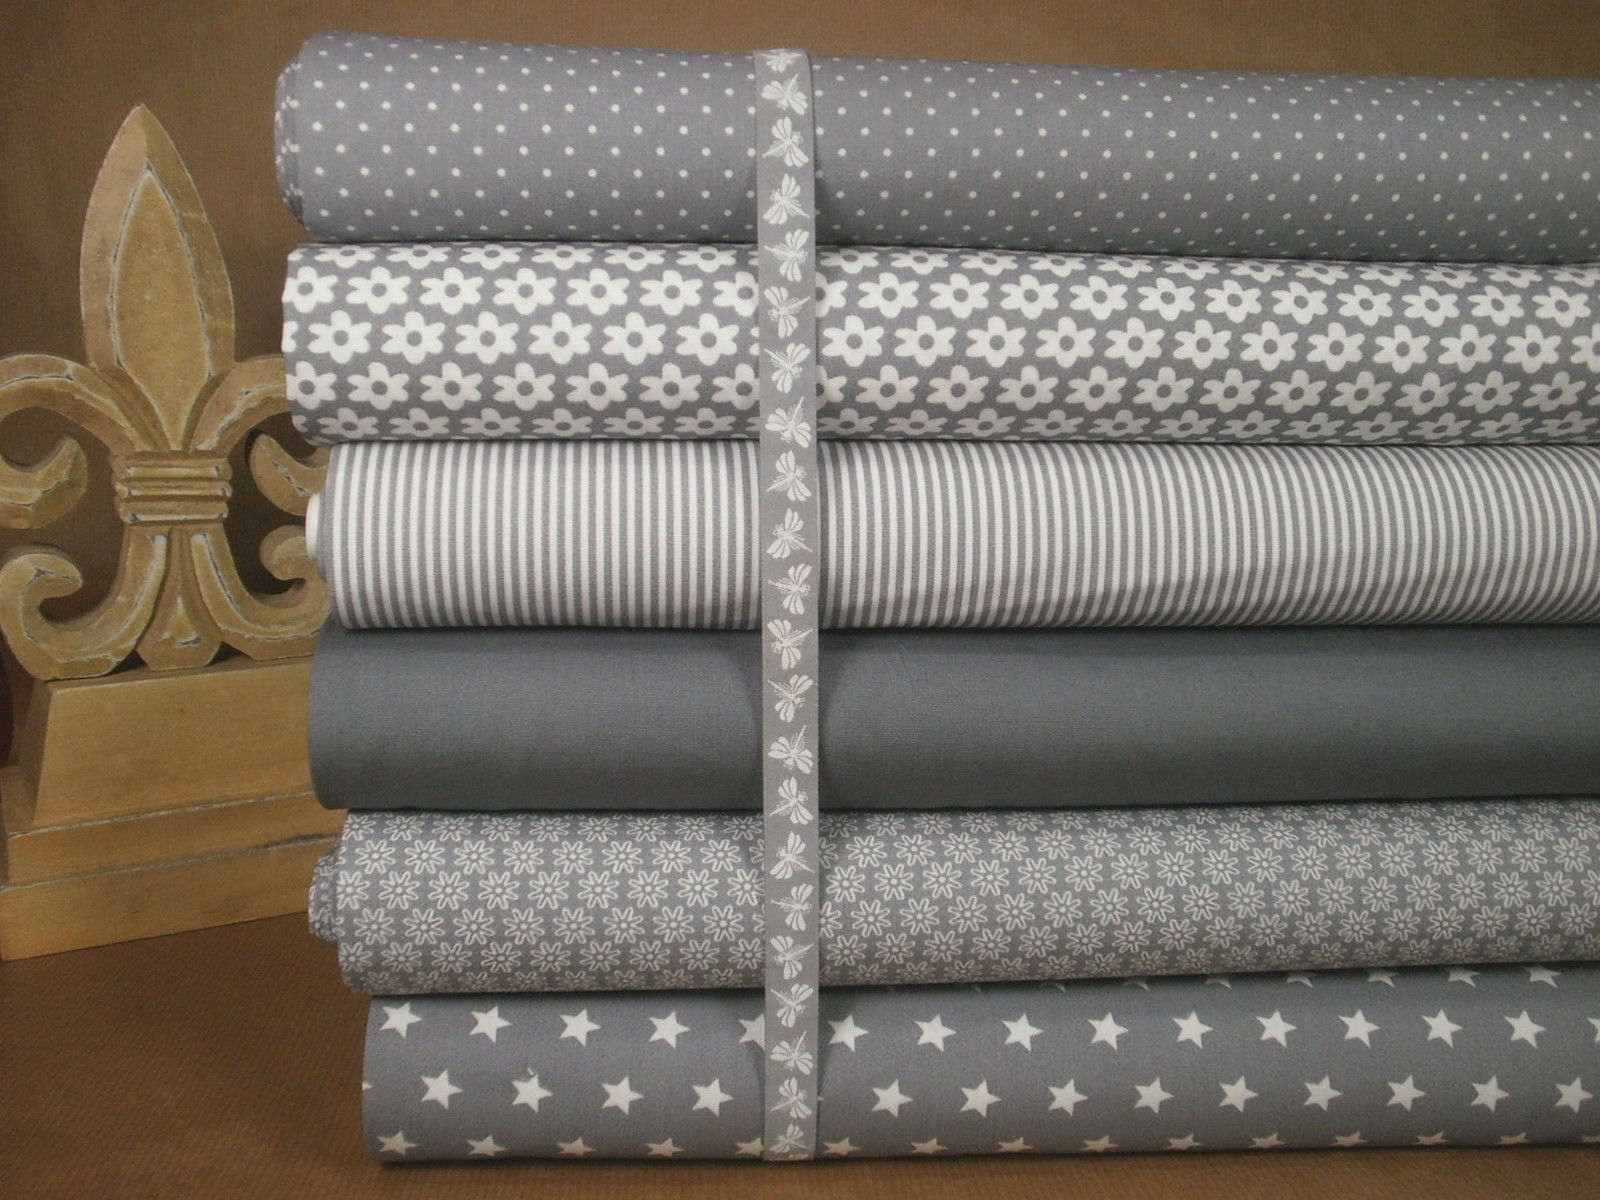 Stoffpaket Landhaus 6x30x70cm + Band Baumwolle Stoffe grau shabby Libelle Sterne